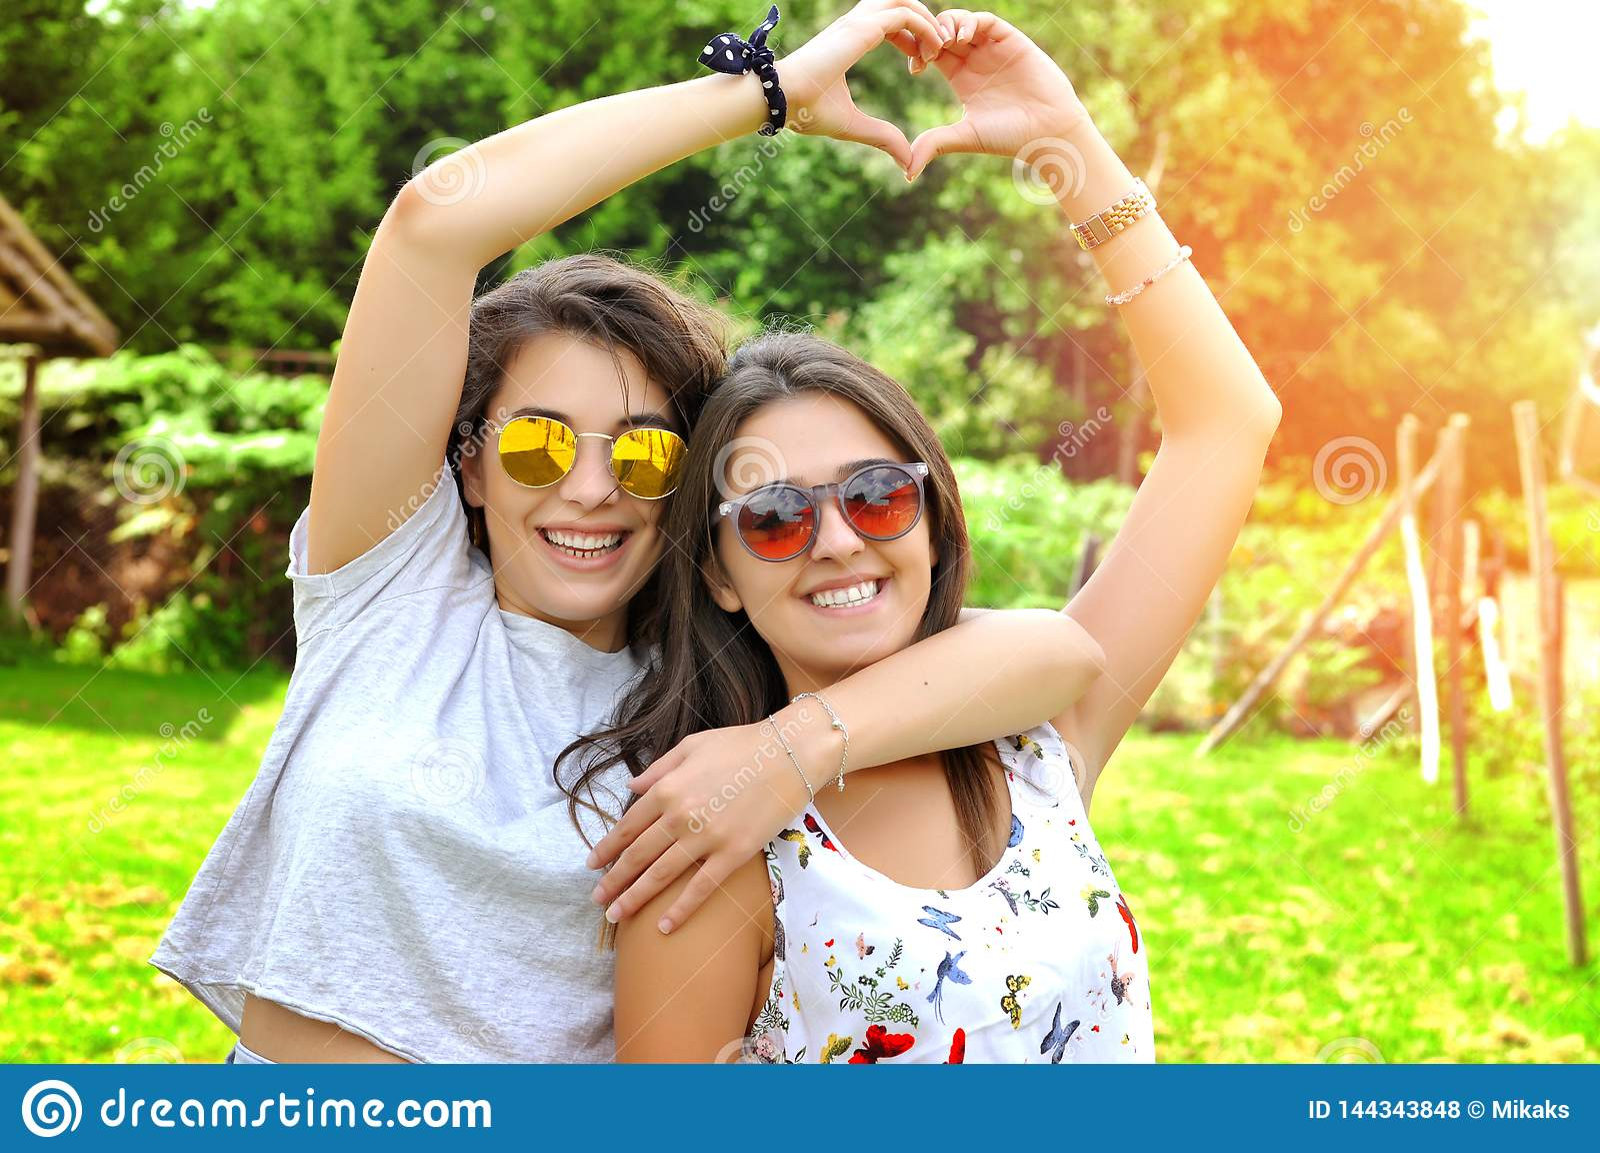 Best Friends Girls Showing Heart Gesture Stock Photo Image Of Caucasian Friends 144343848